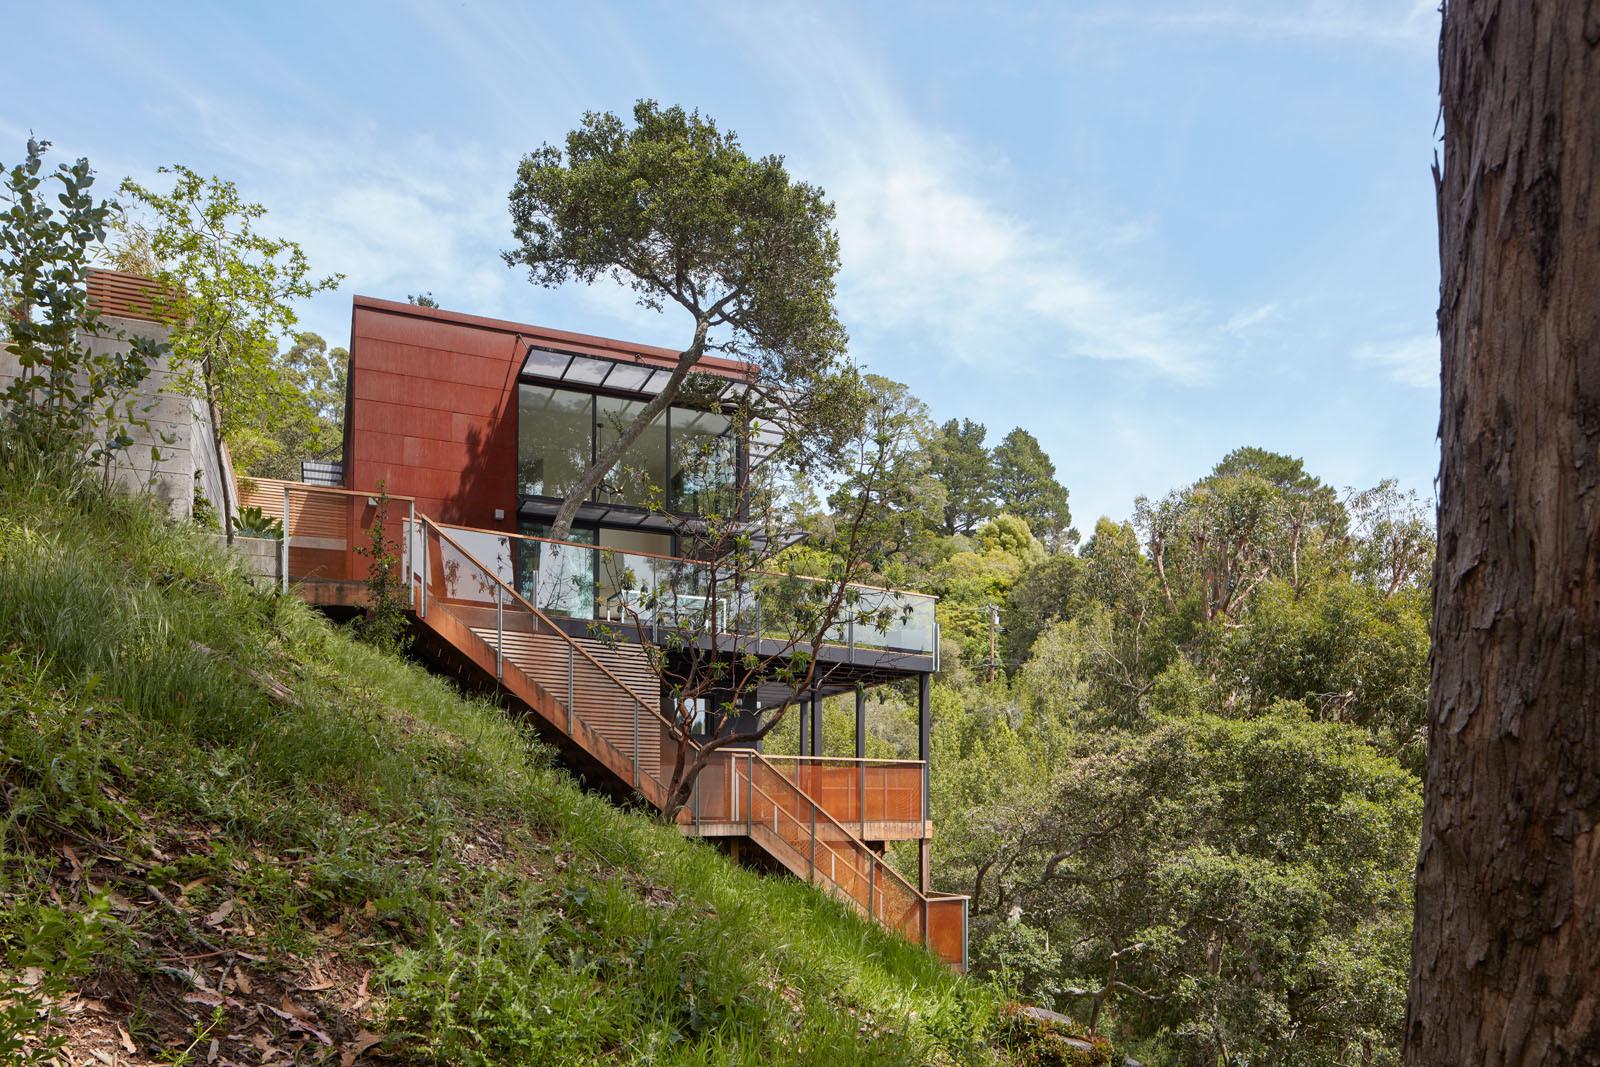 Tamalpais Residence / Zack de Vito Architecture + Construction